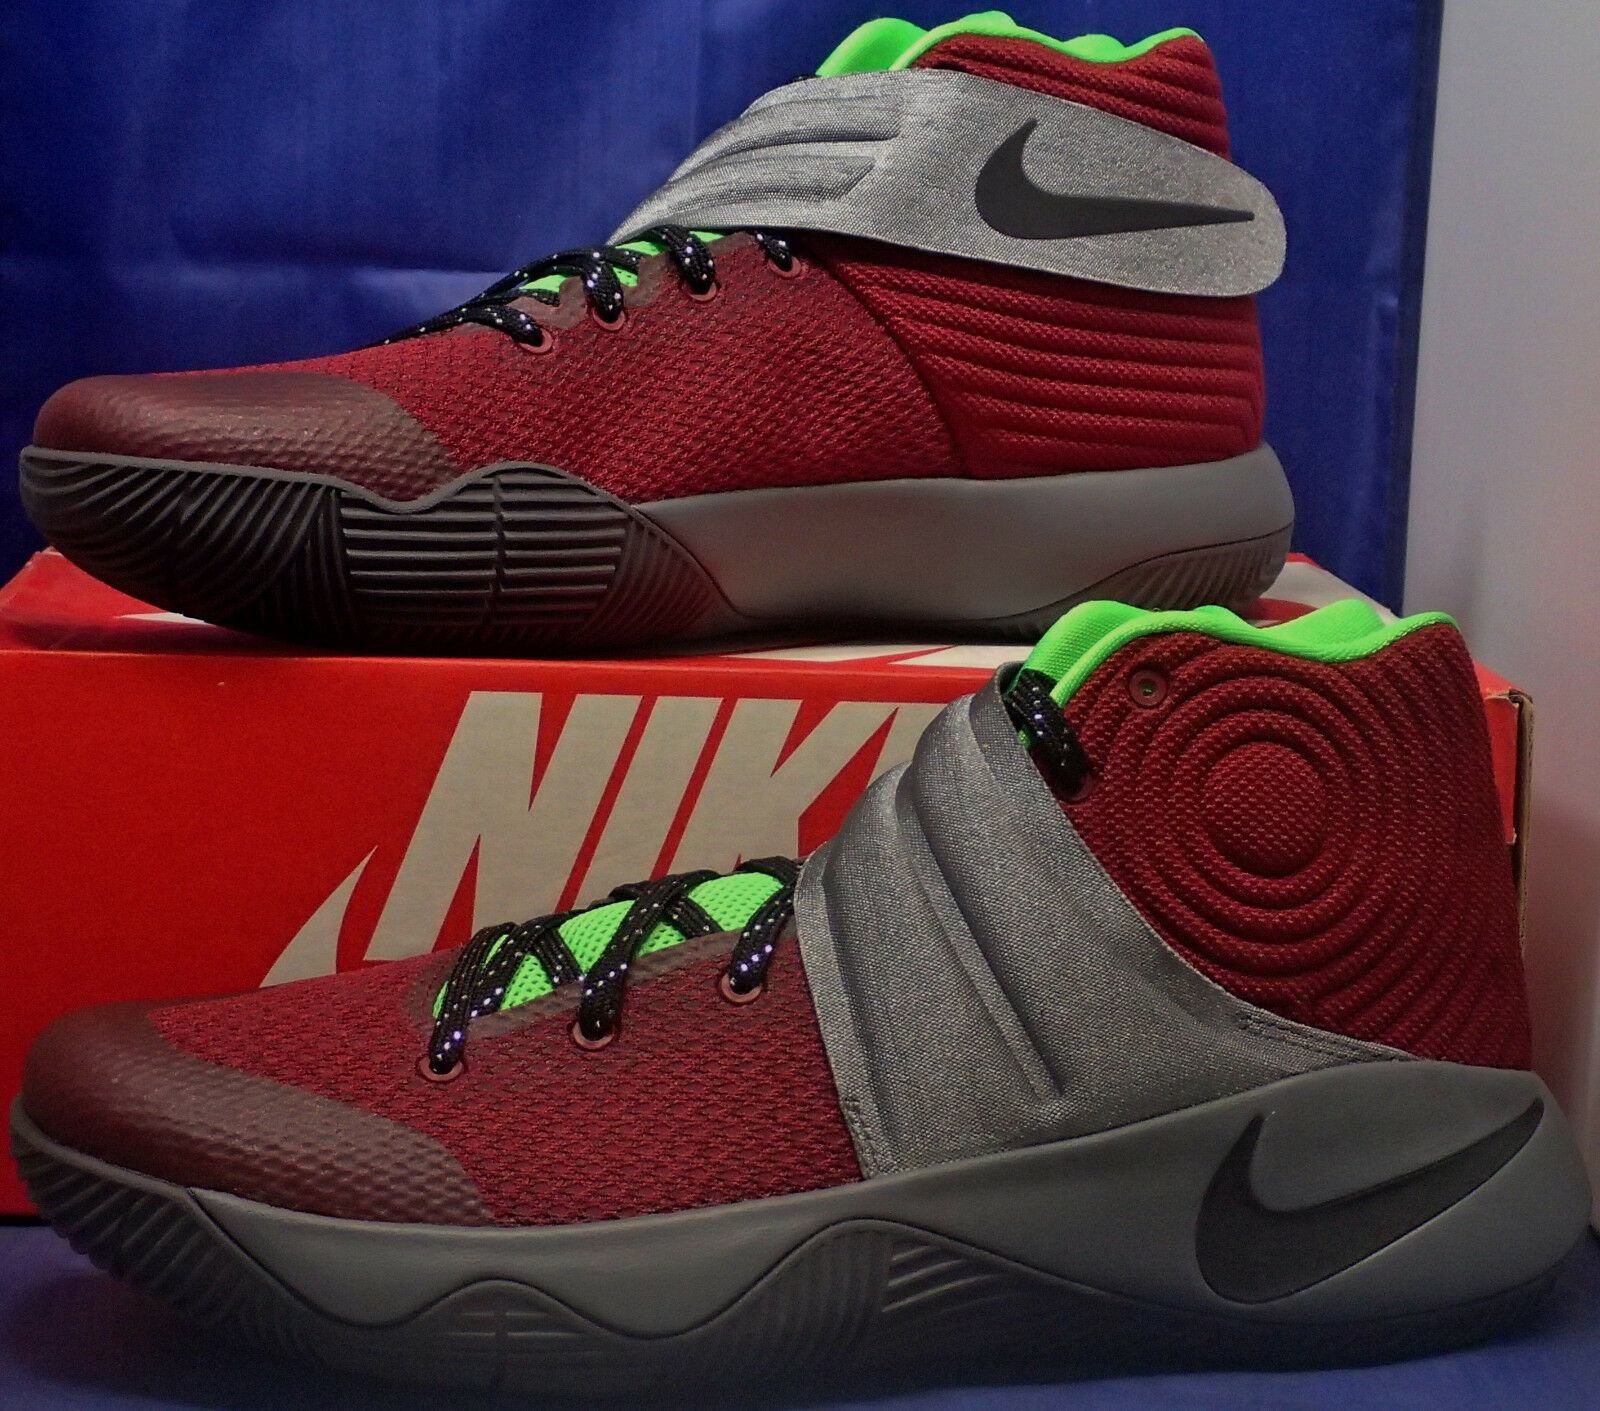 Nike Zoom Kyrie 2 Identificazione Team rosso  (Maroon) Hellgr 65533;n grigio Sz 11  molte concessioni